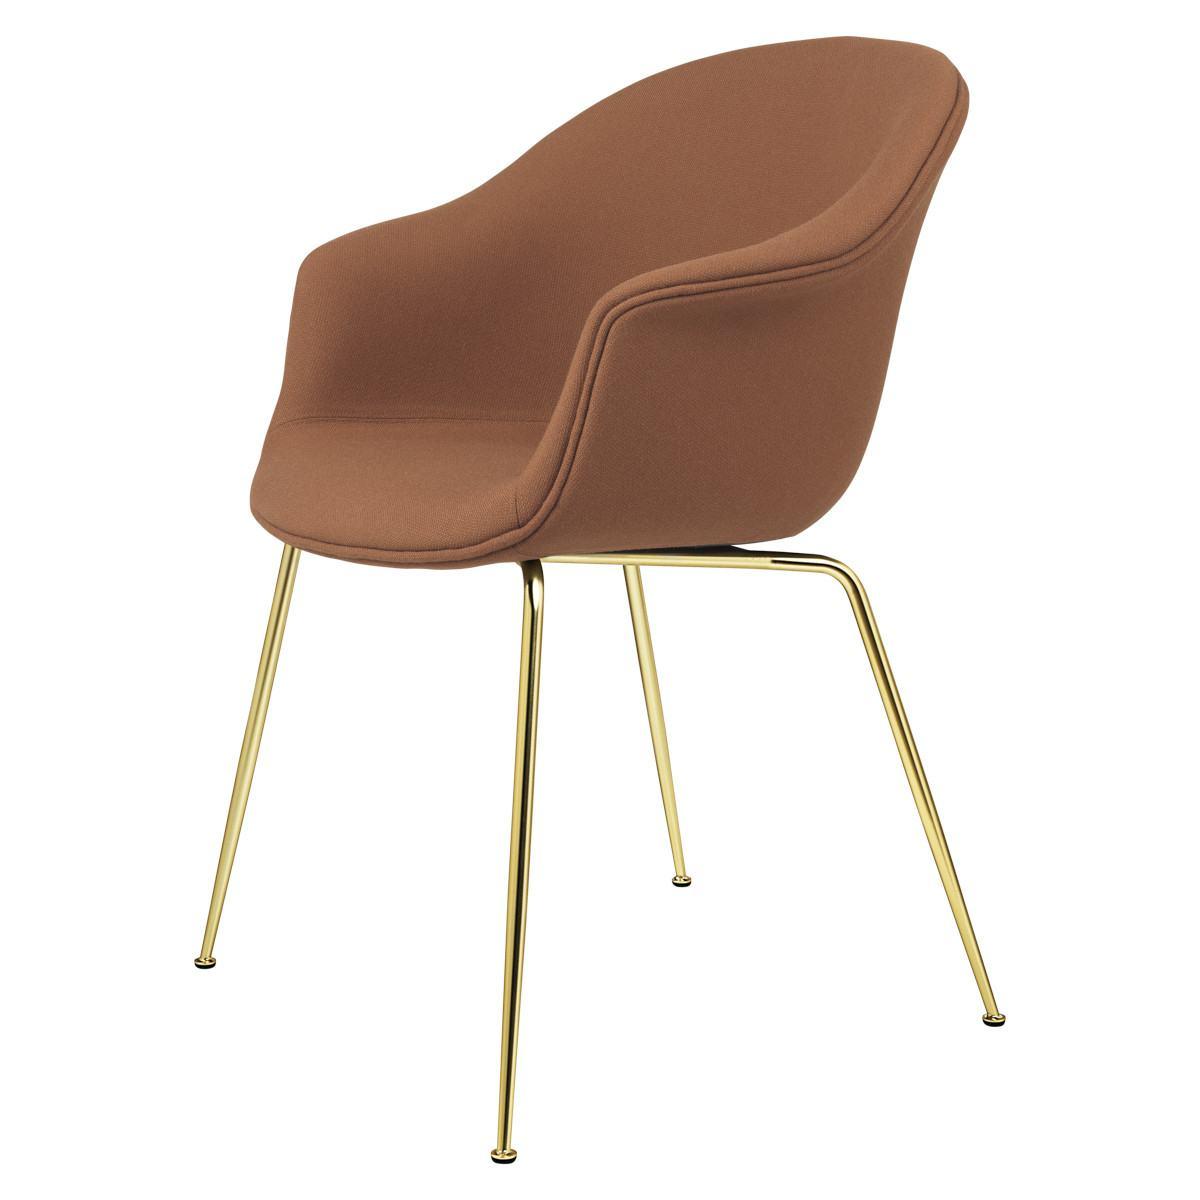 Gubi Bat Dining Chair - Conic Base